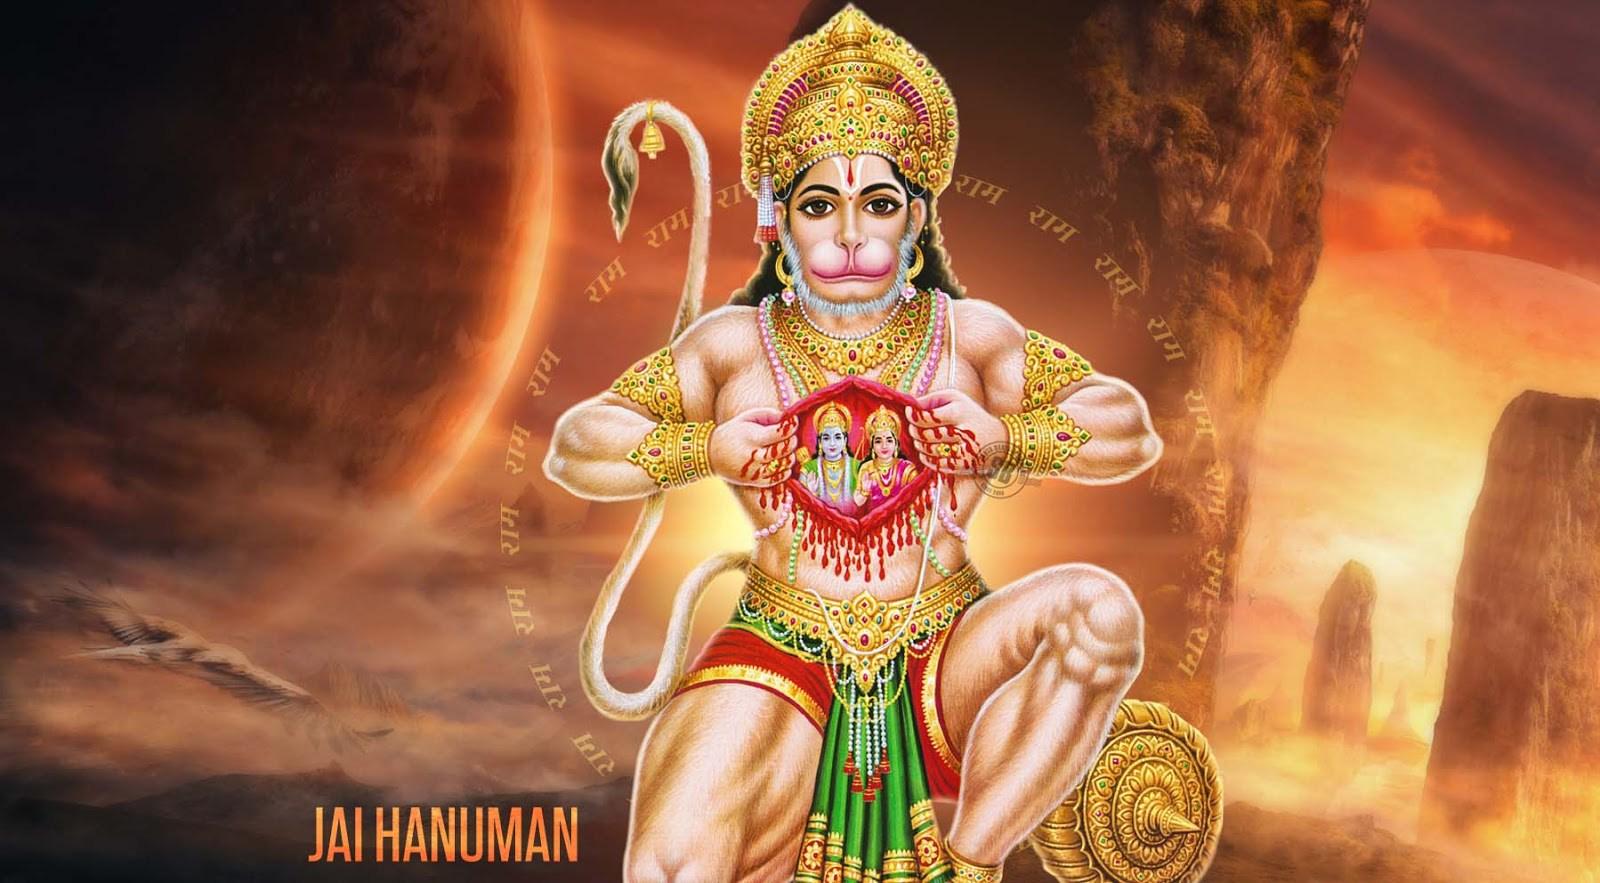 Lord Hanuman Story And Hanuman Chalisa Benefits - Mohan